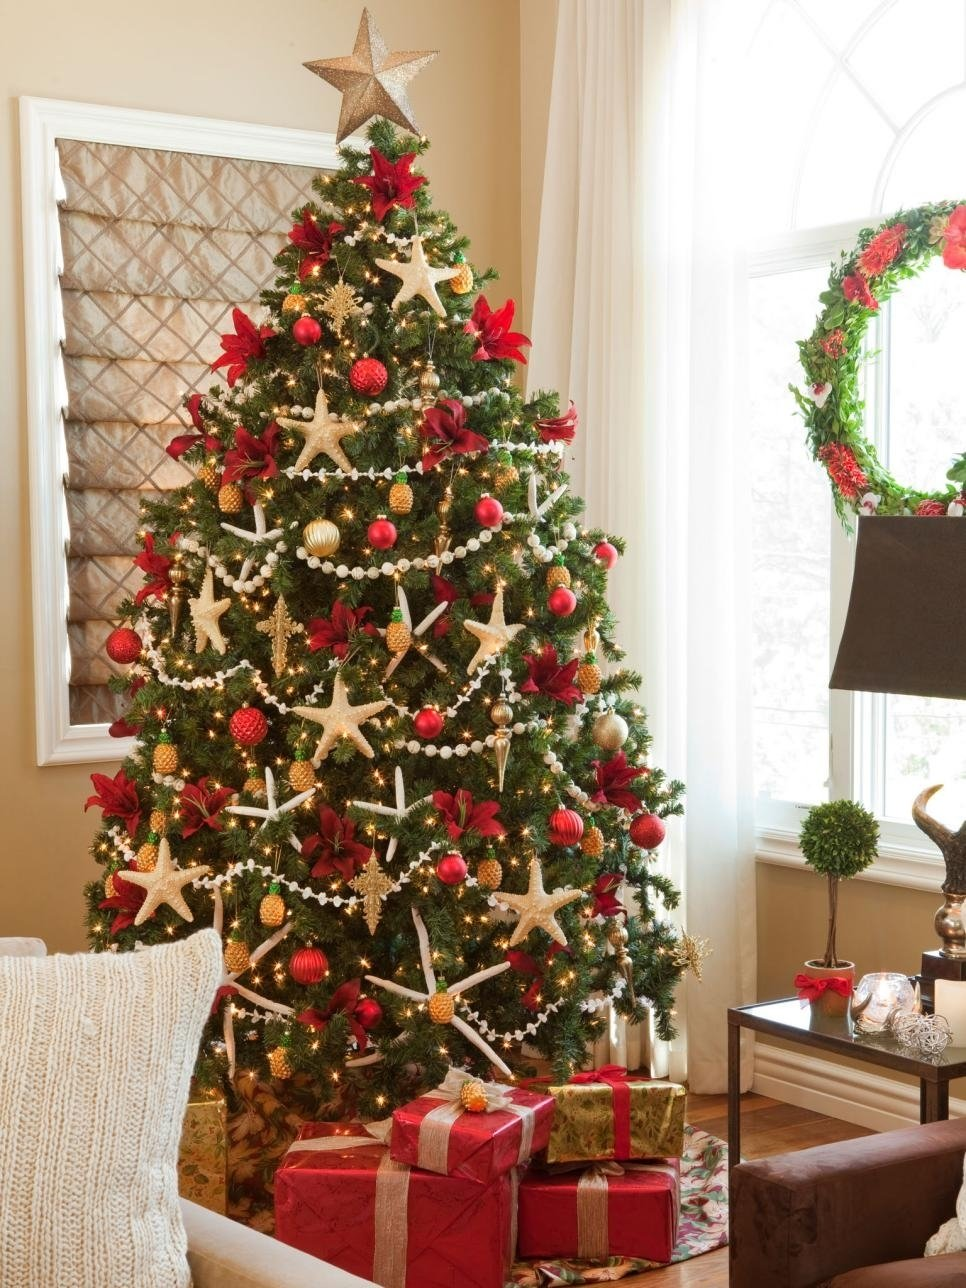 10 Attractive Hgtv Christmas Tree Decorating Ideas themes for christmas tree decorating fun for christmas 2020